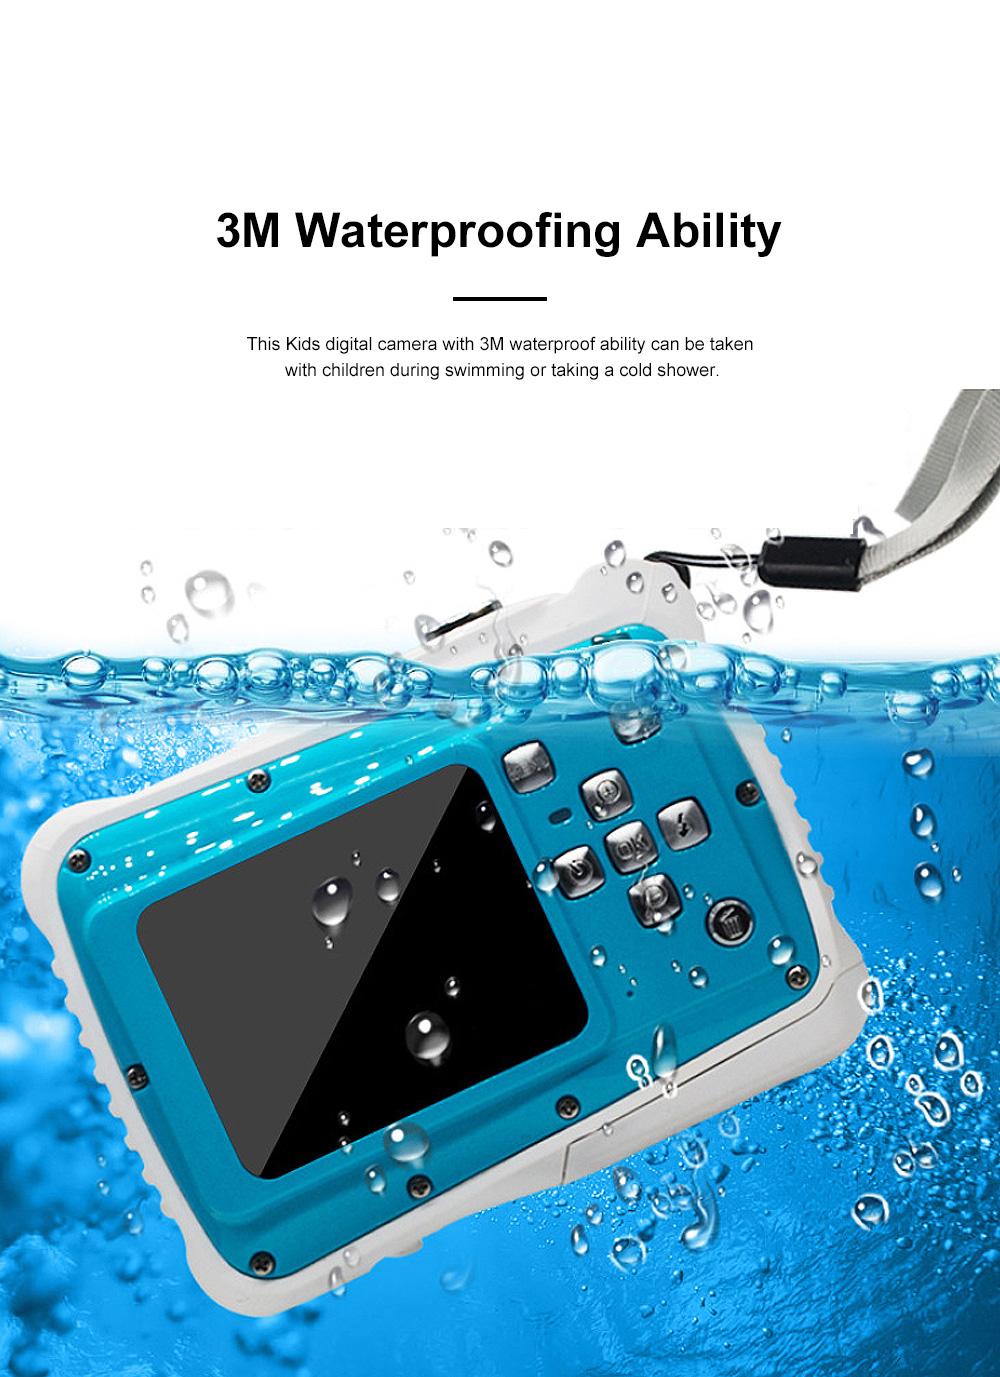 Delicate Portable Breaking-proof 3M Waterproof Children HD Digital Camera 21 Million Pixels Cam for Kids 2